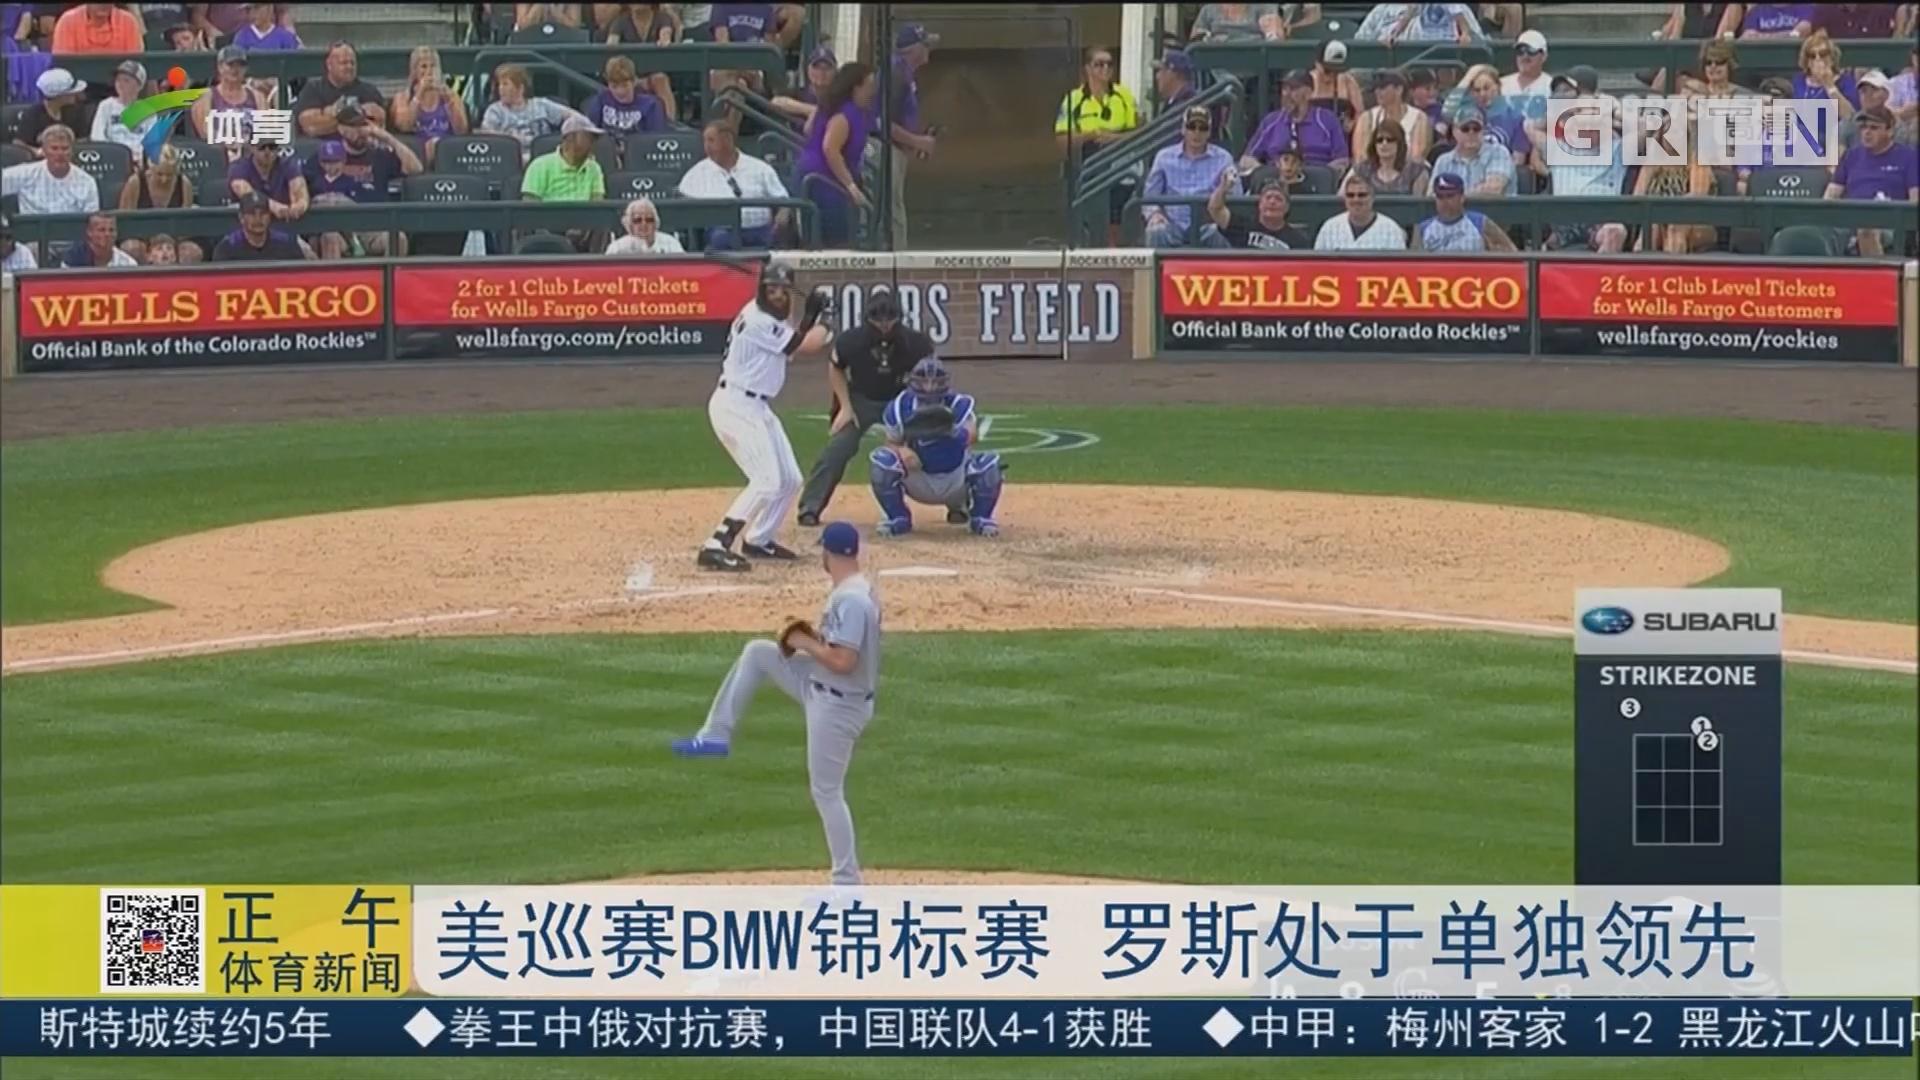 MLB 道奇客场赢下关键战